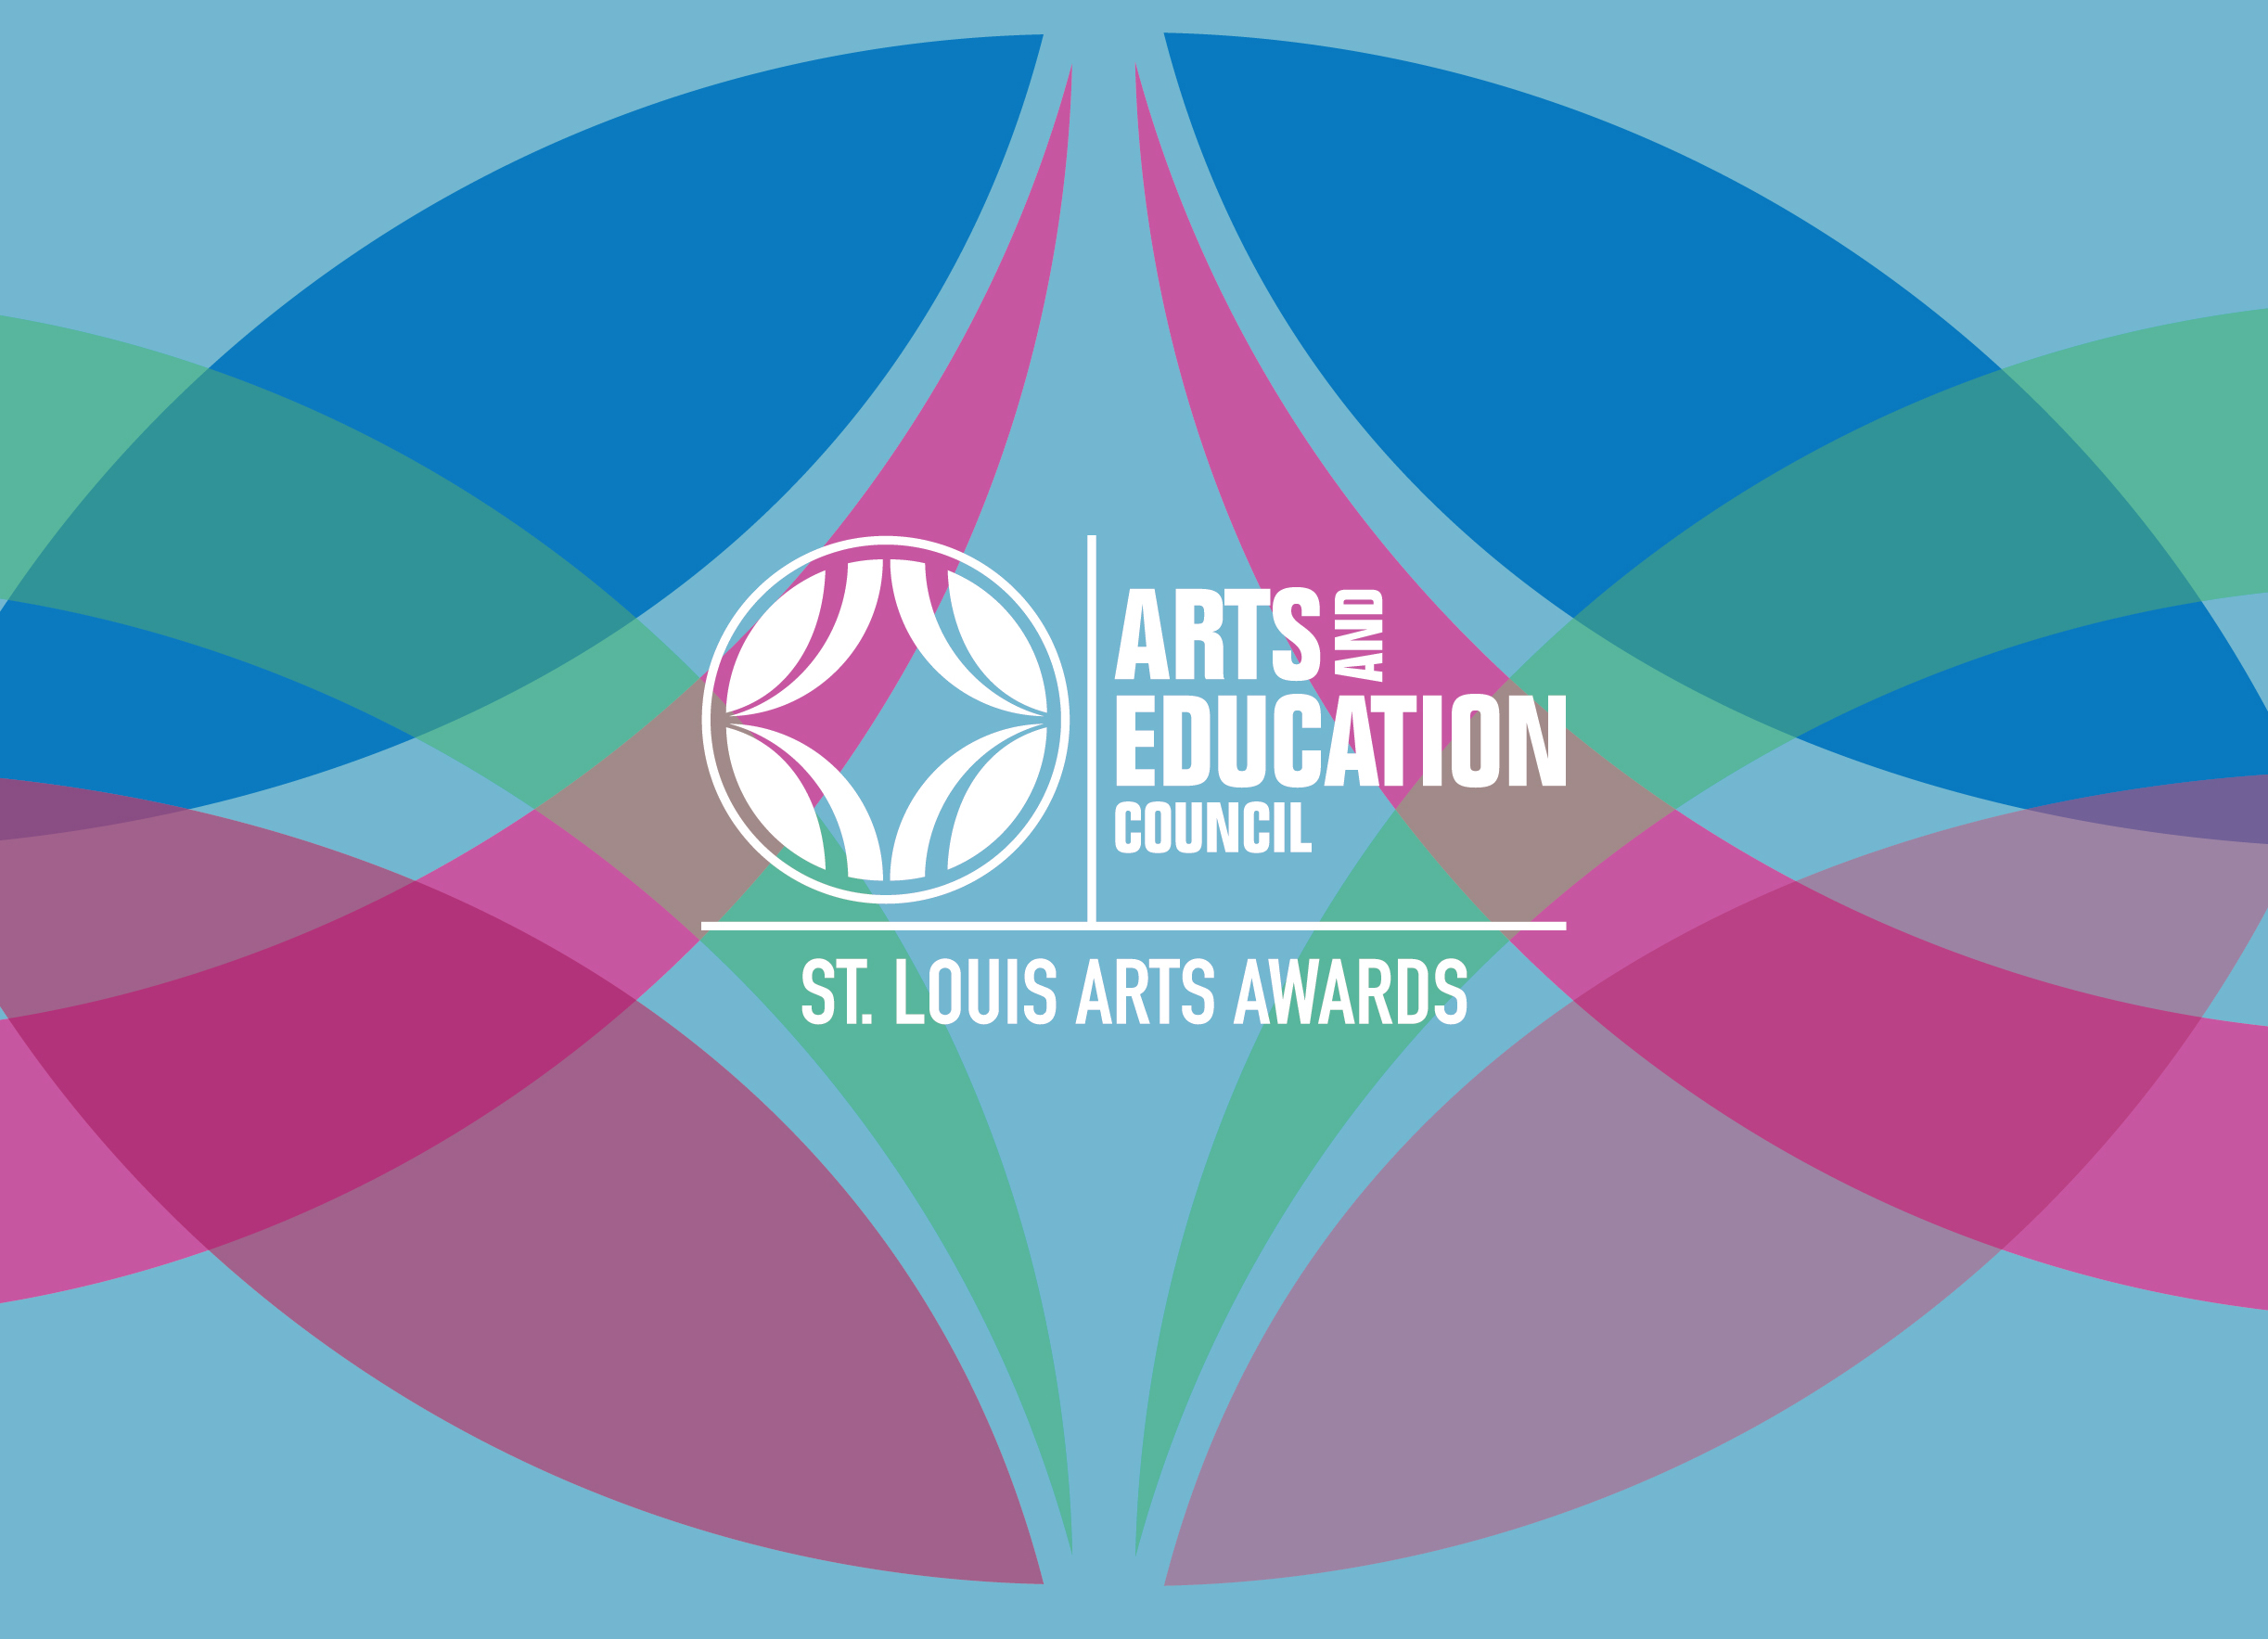 2021 St. Louis Arts Awards